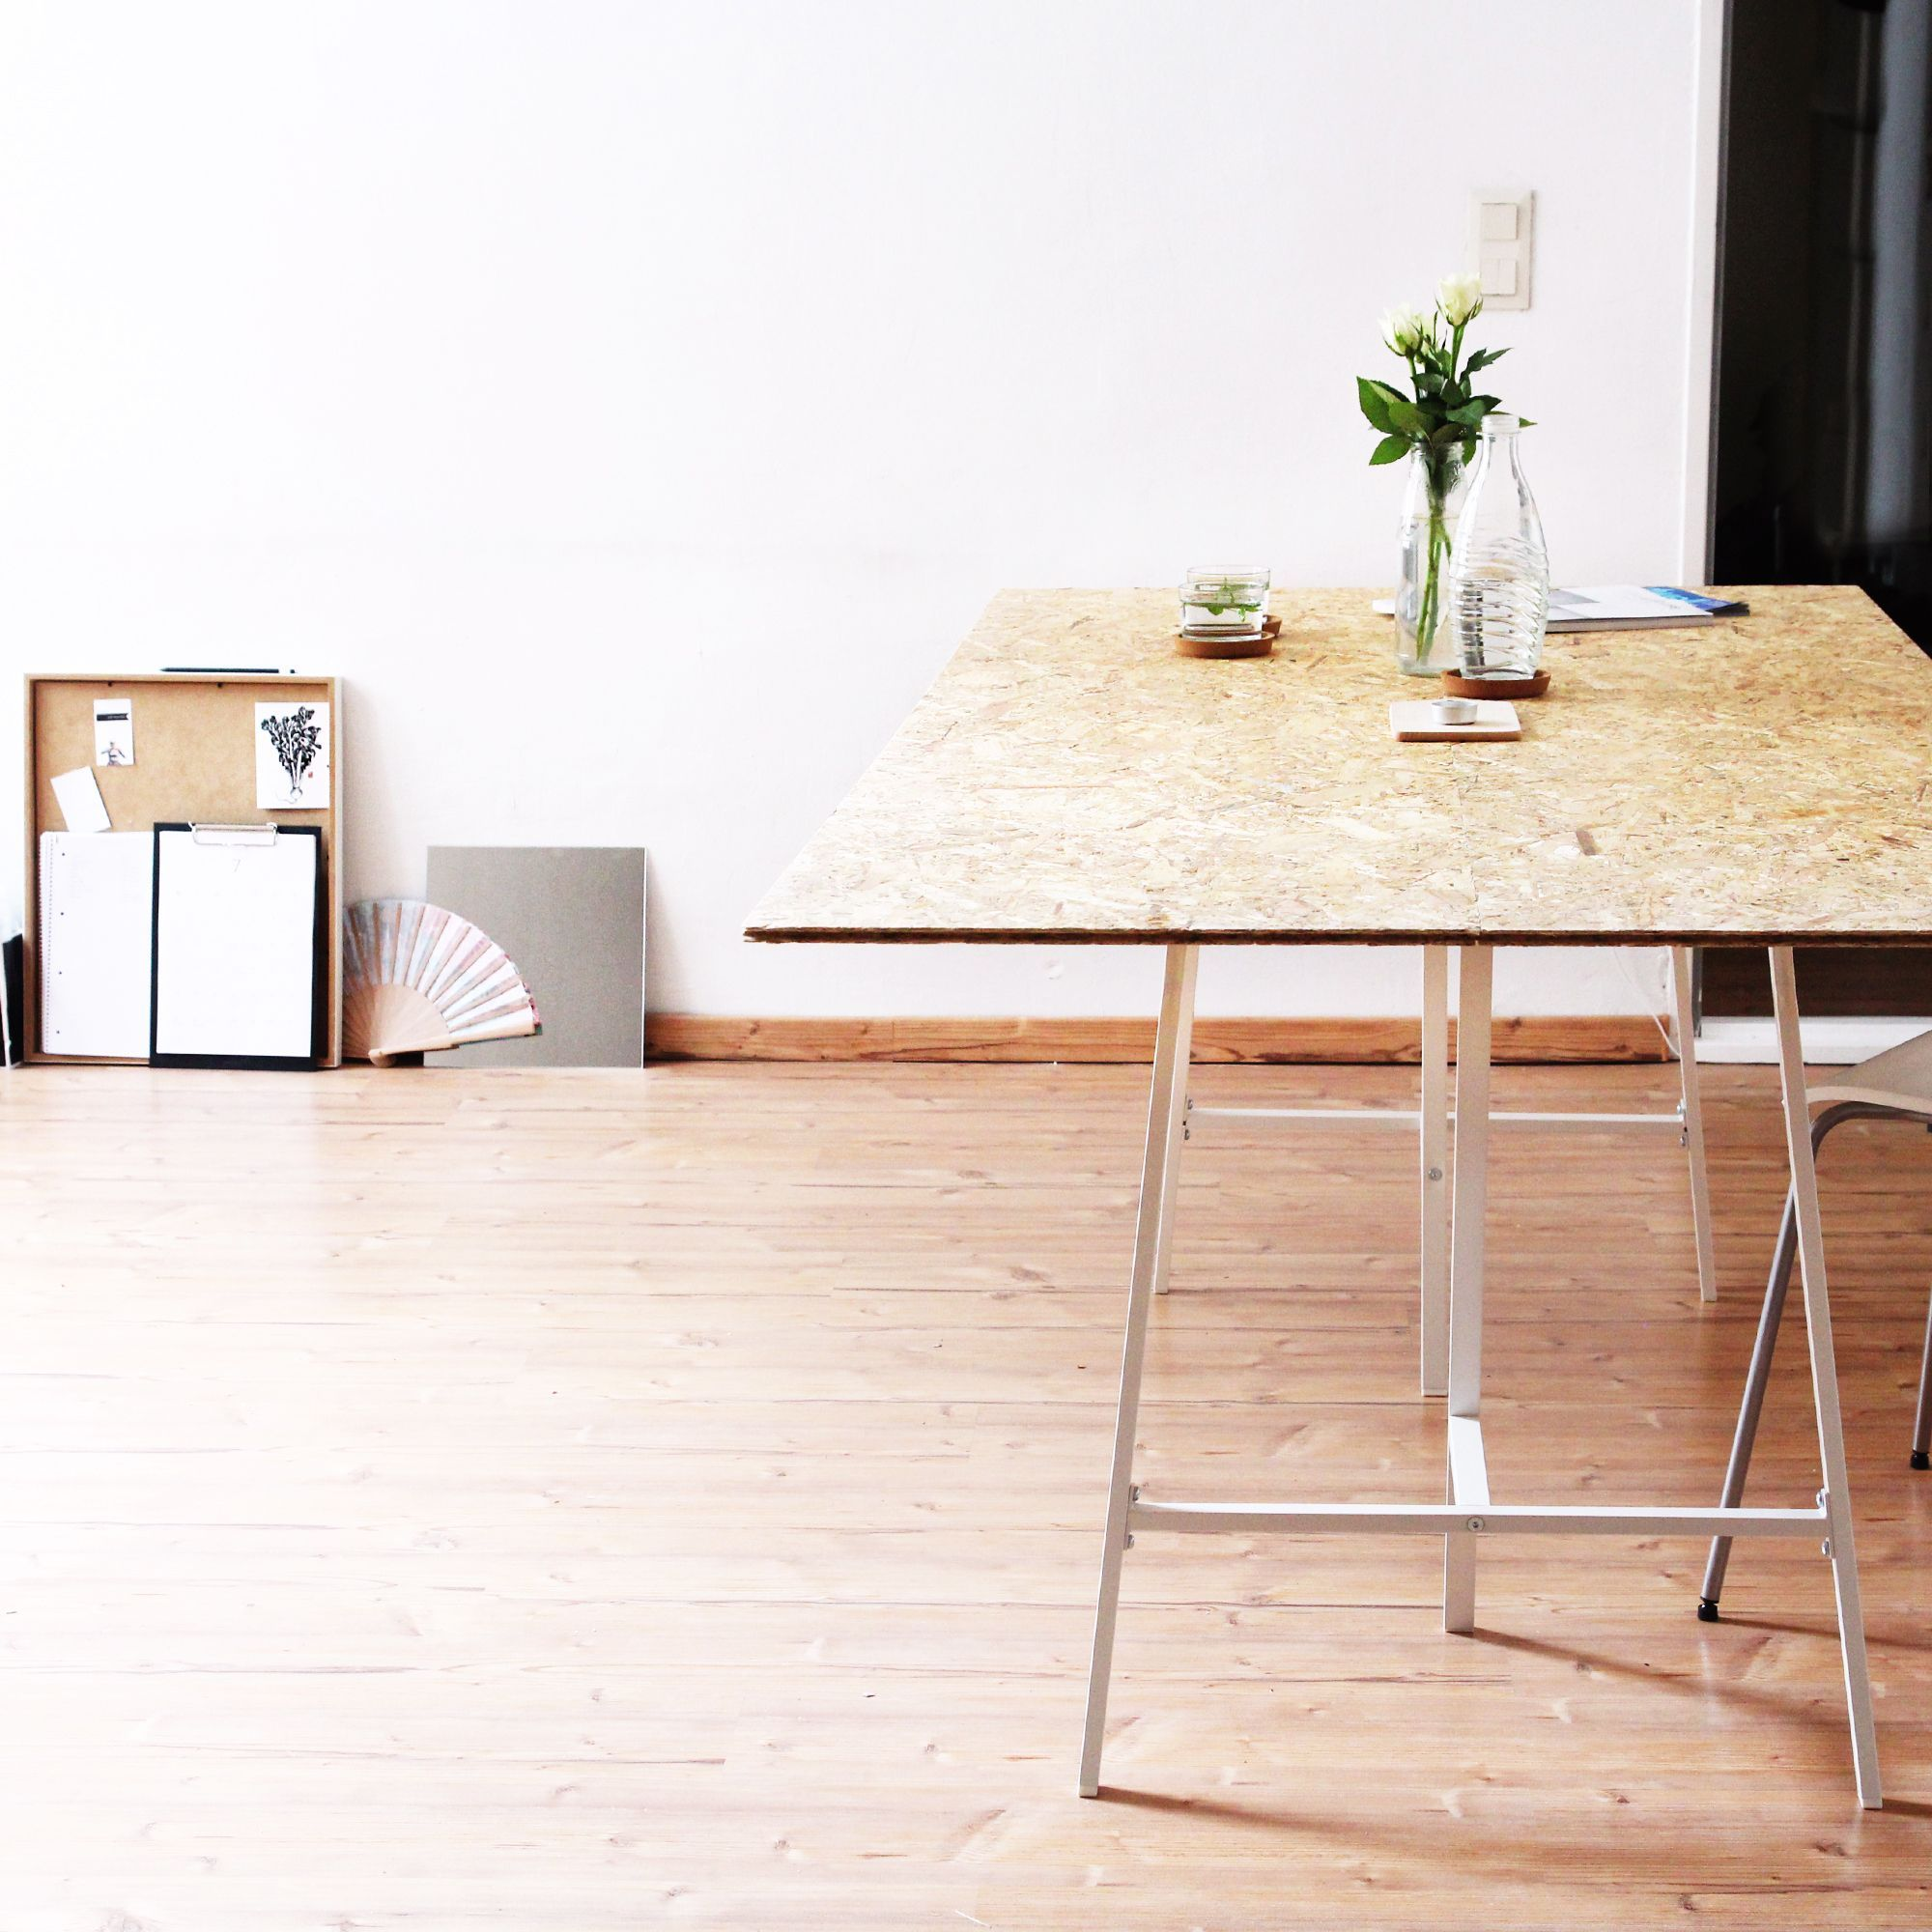 Jenny Mustard Minimalist Home Decor Diy Table #Minimalistdecorinteriordesign